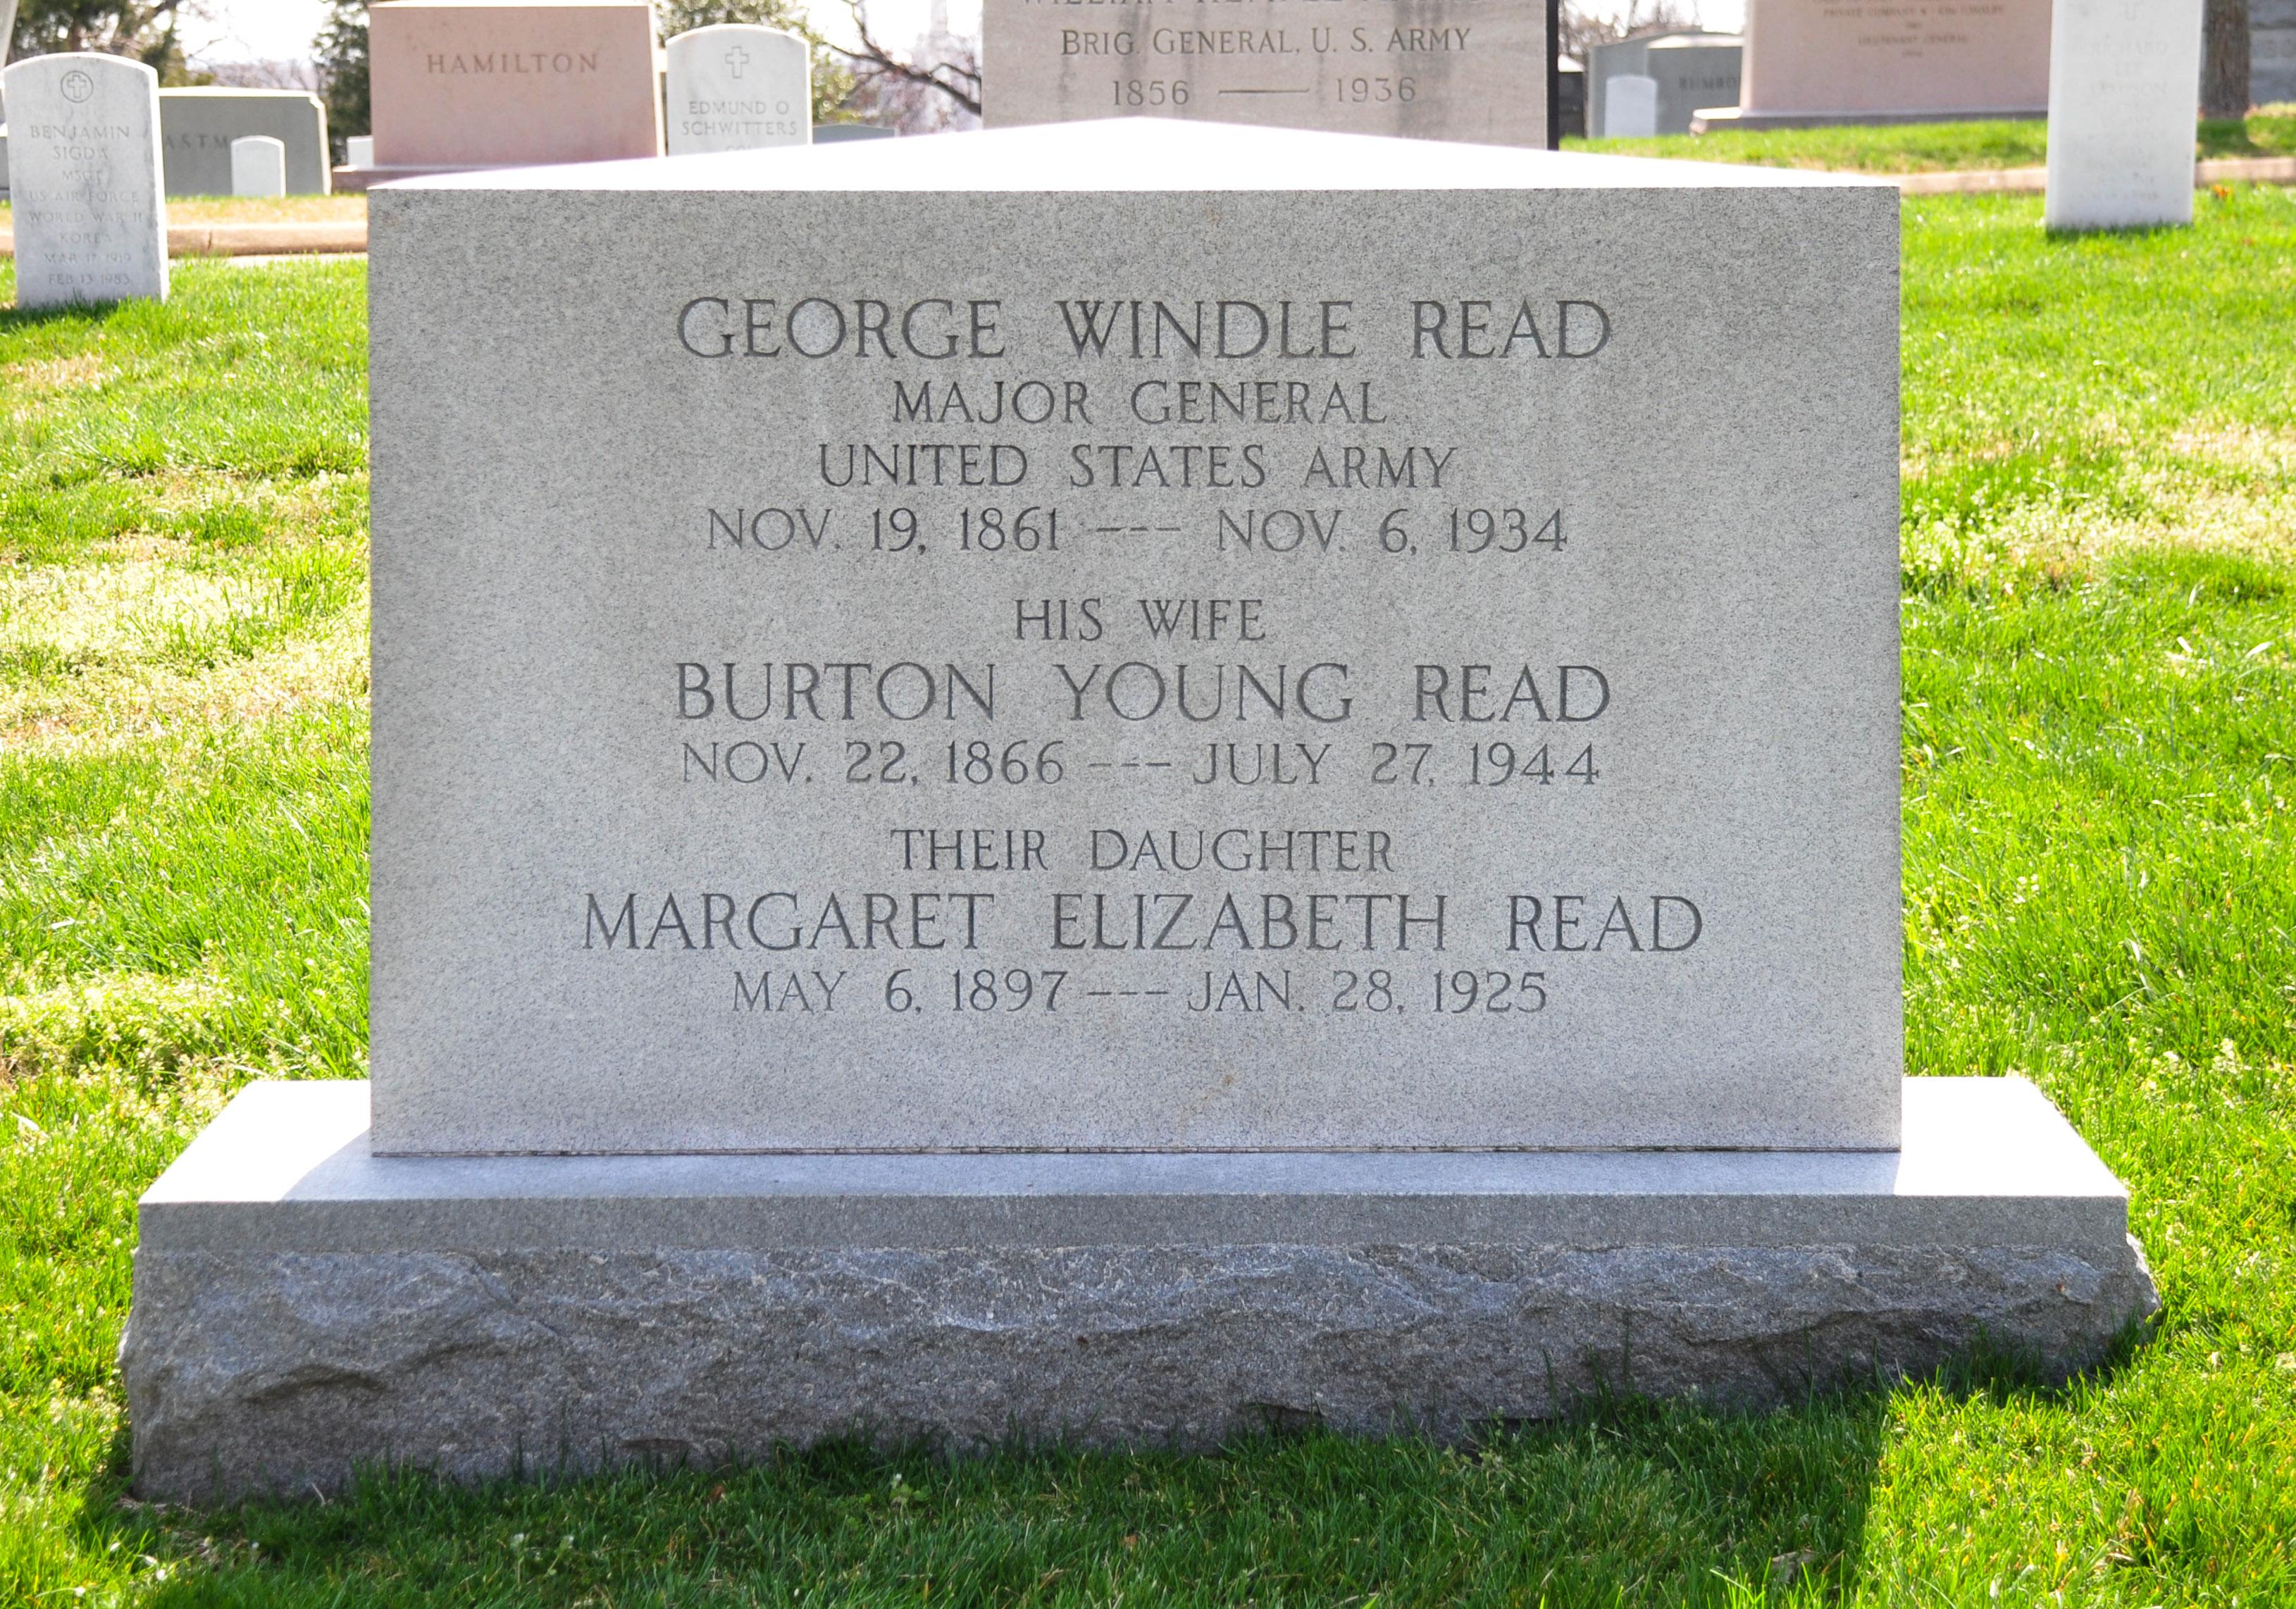 MG George Windle Read